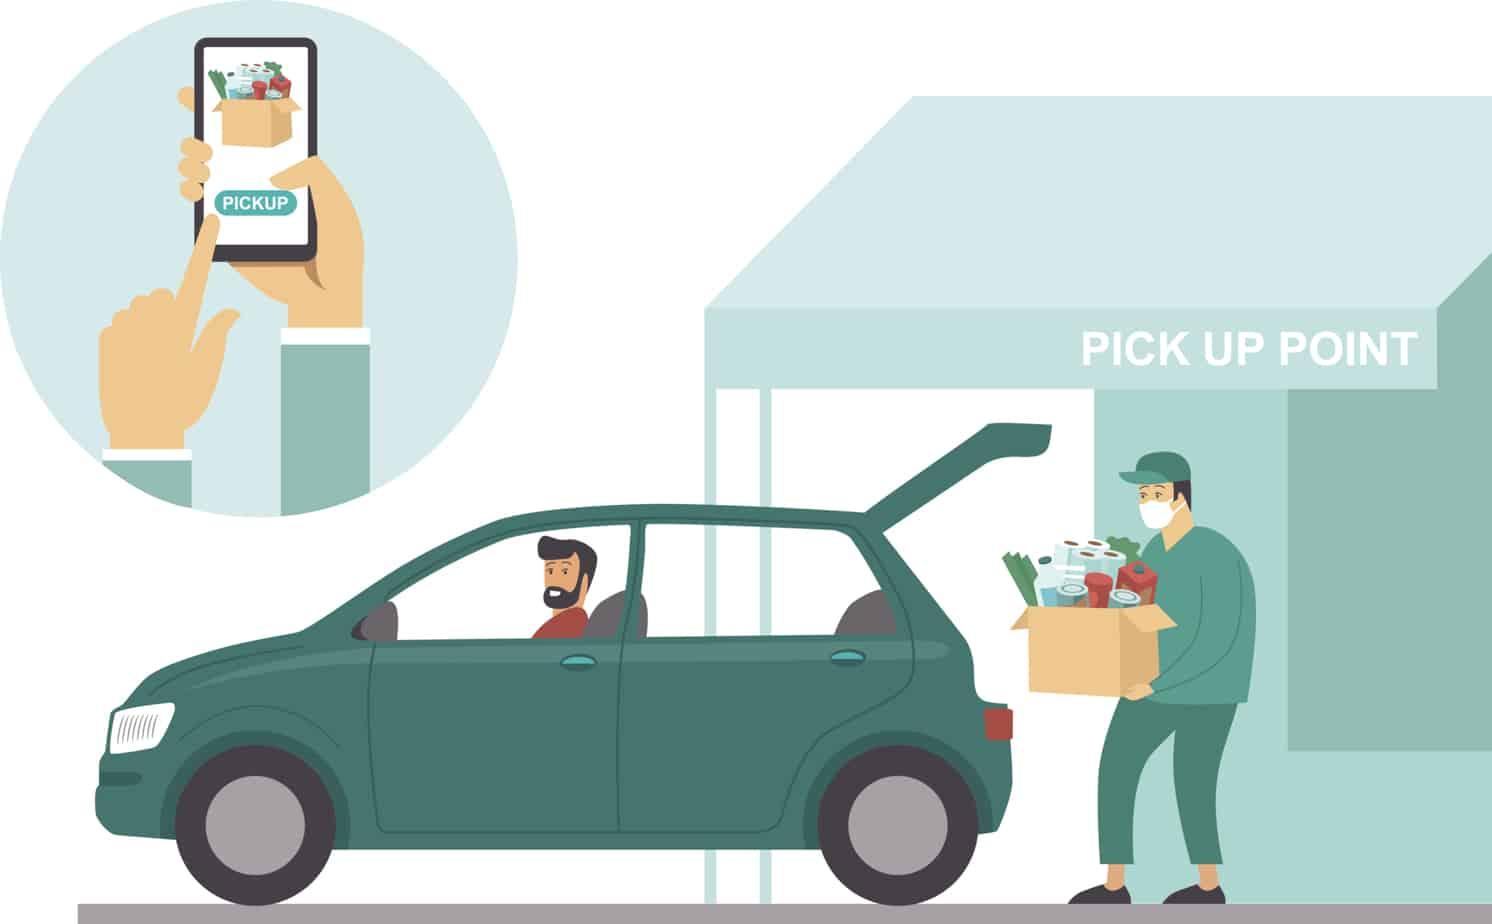 Pick Up Point In Food Supermarket Safe Shopping During Coronavirus Covid 19 Quarantine 179777094